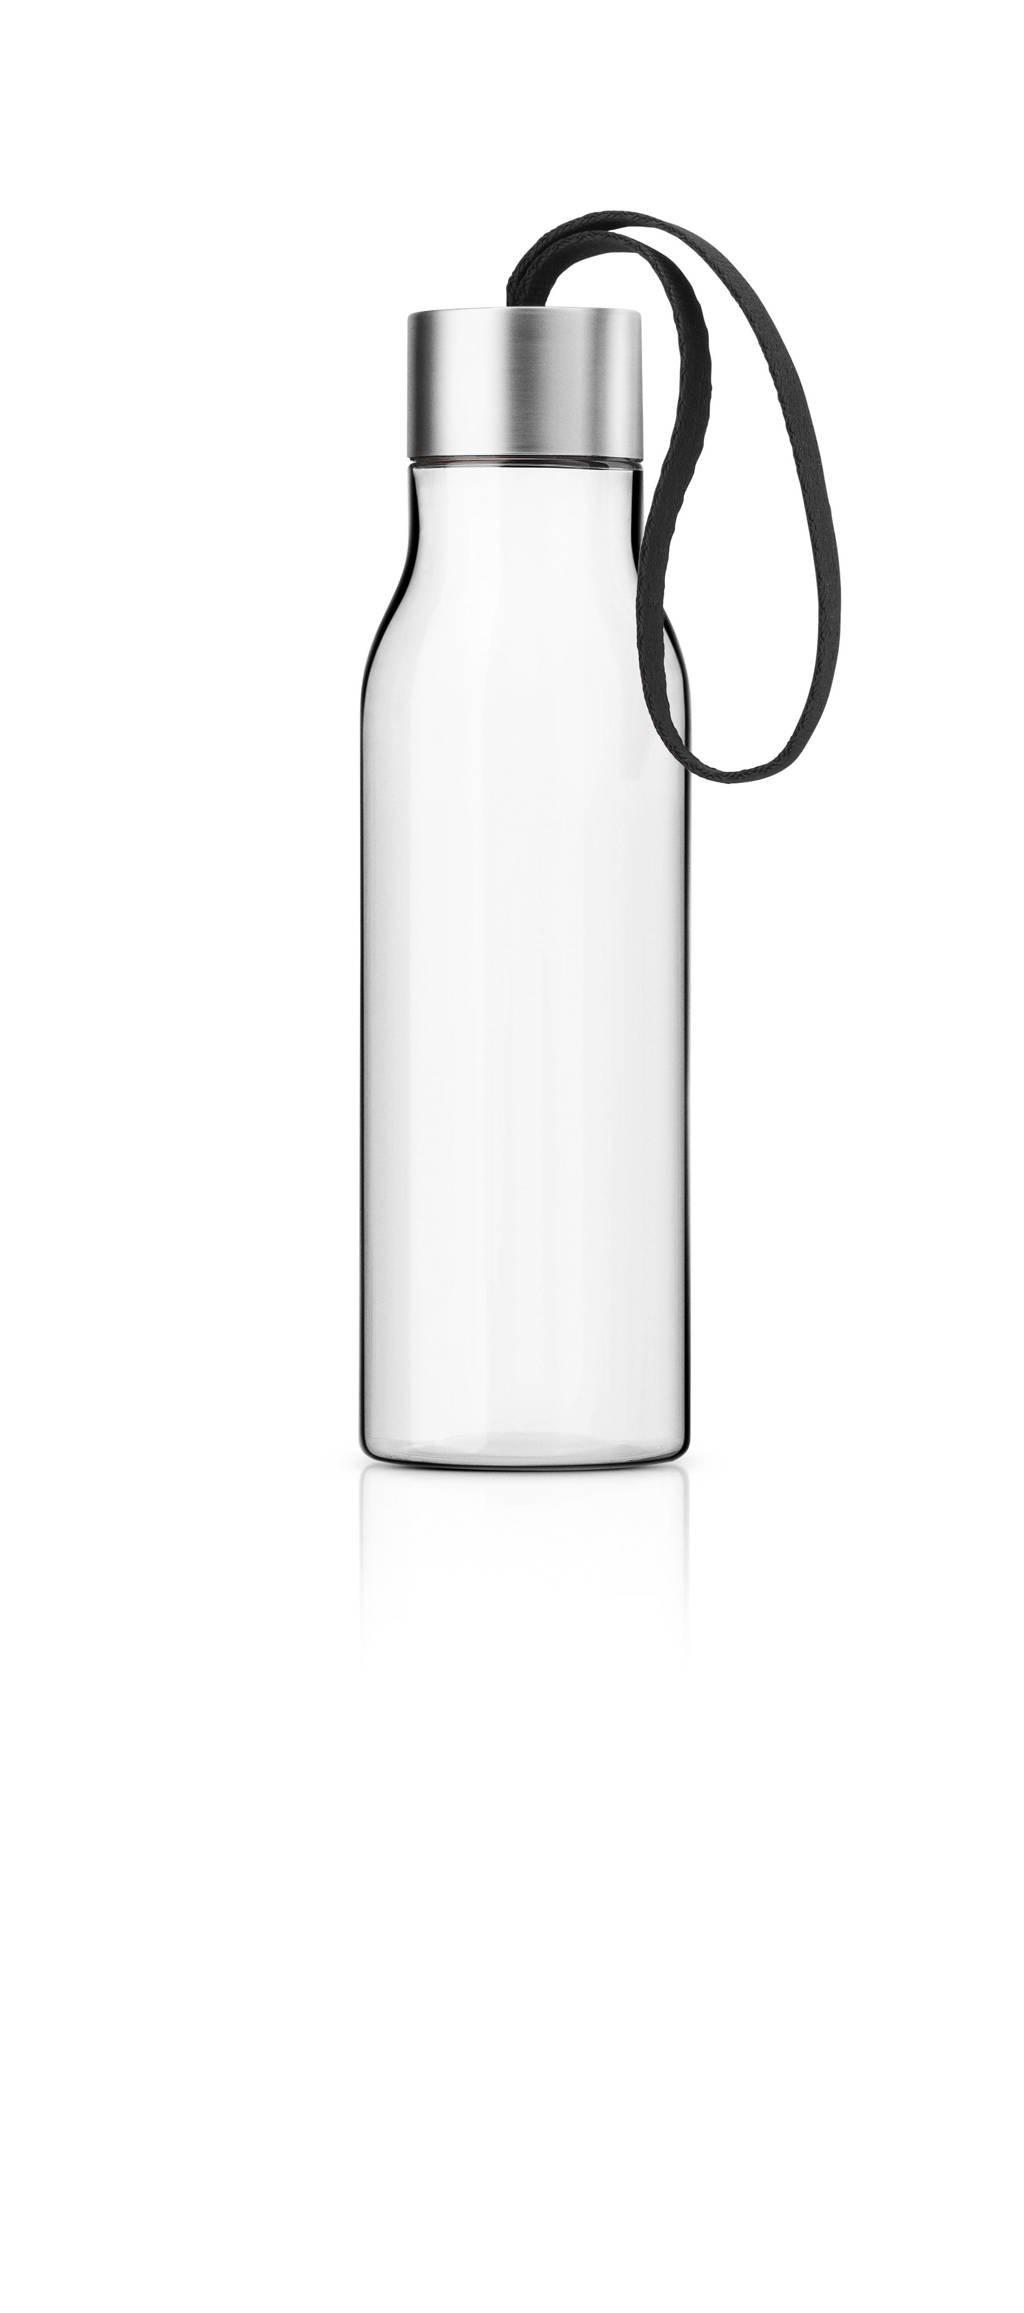 Eva Solo Bidon Black 0.5 liter, Zwart